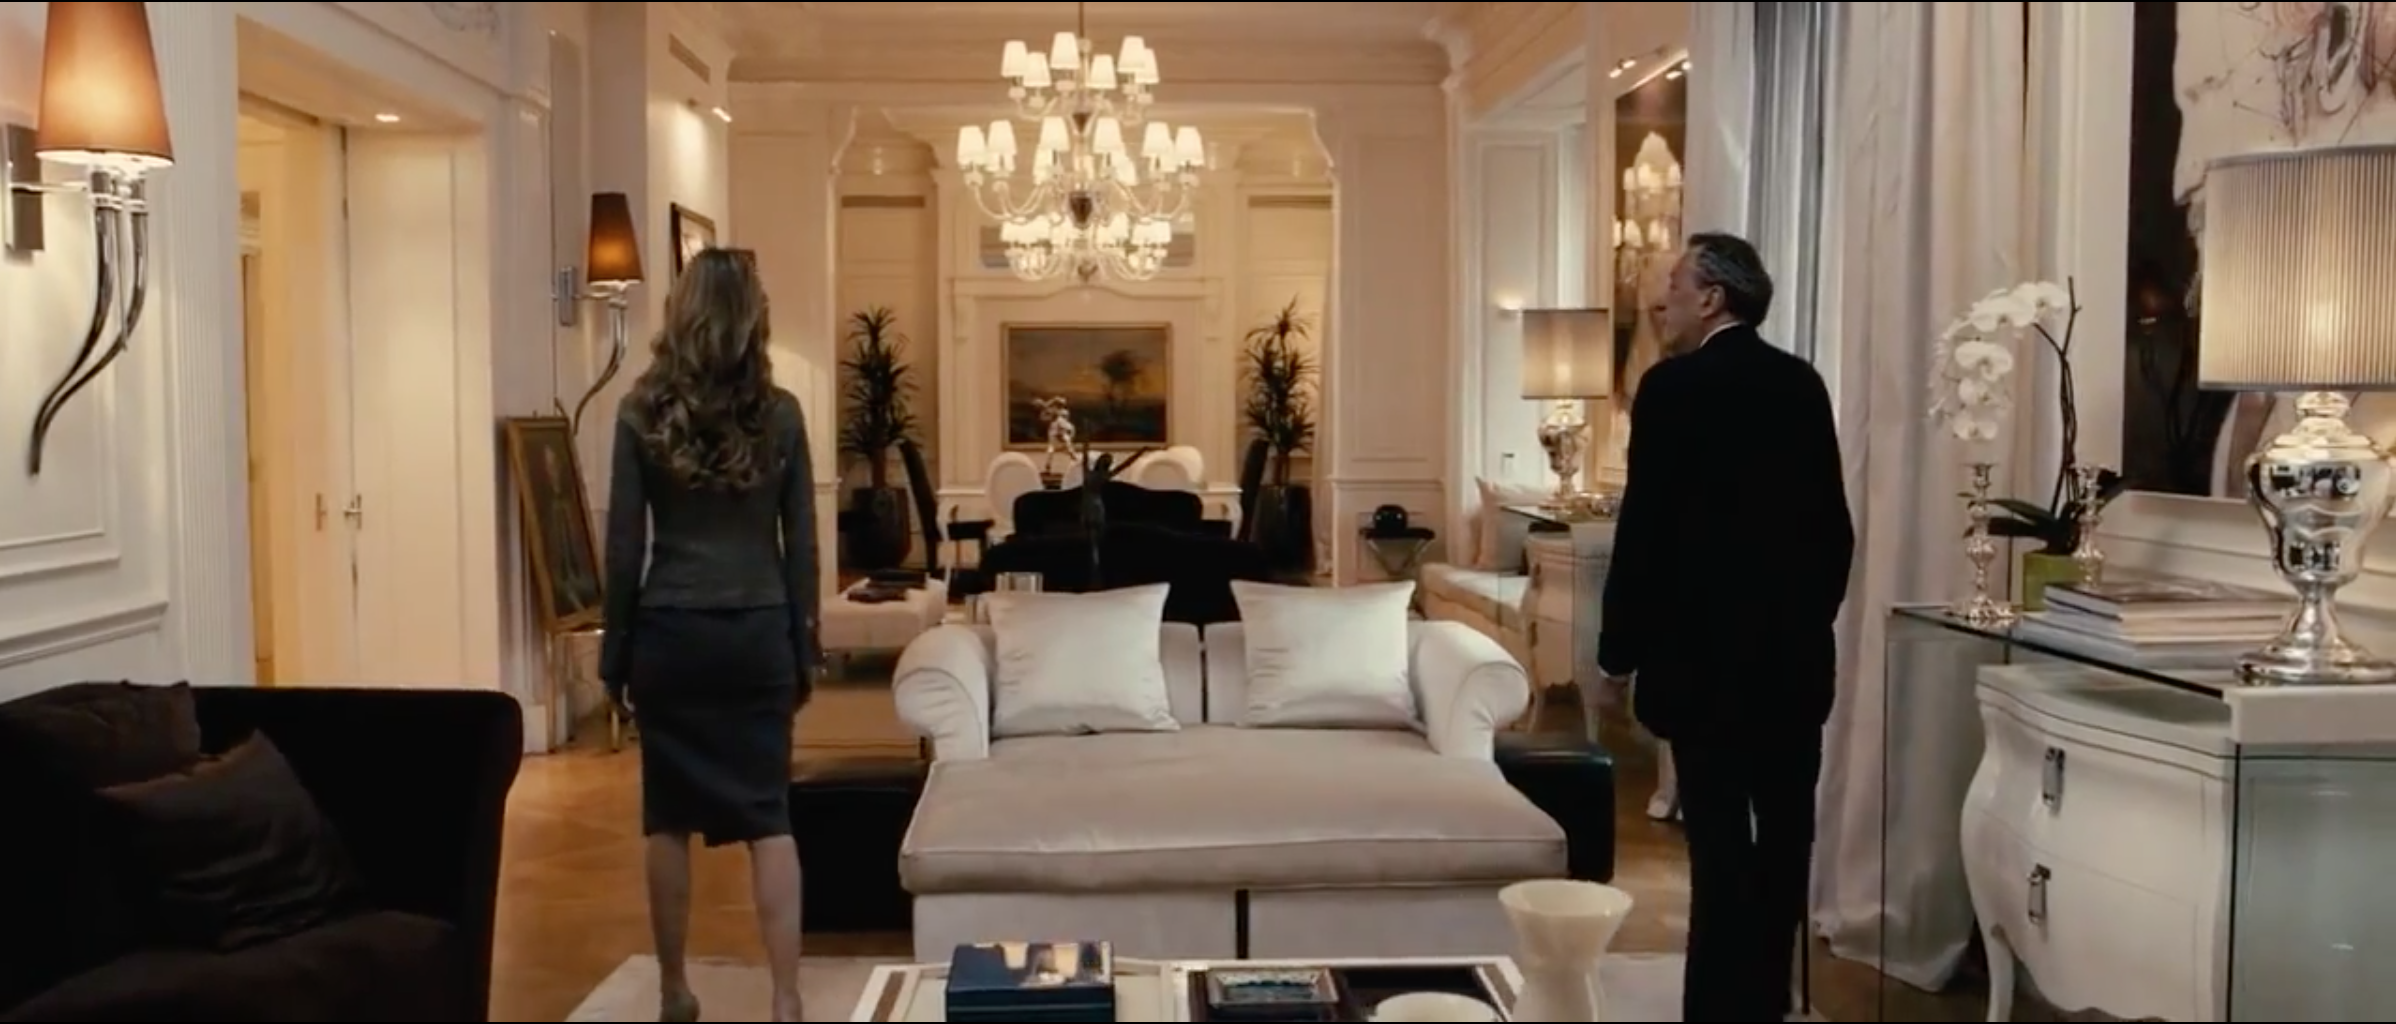 the best offer film house interior | Geoffrey Rush | Pinterest ...